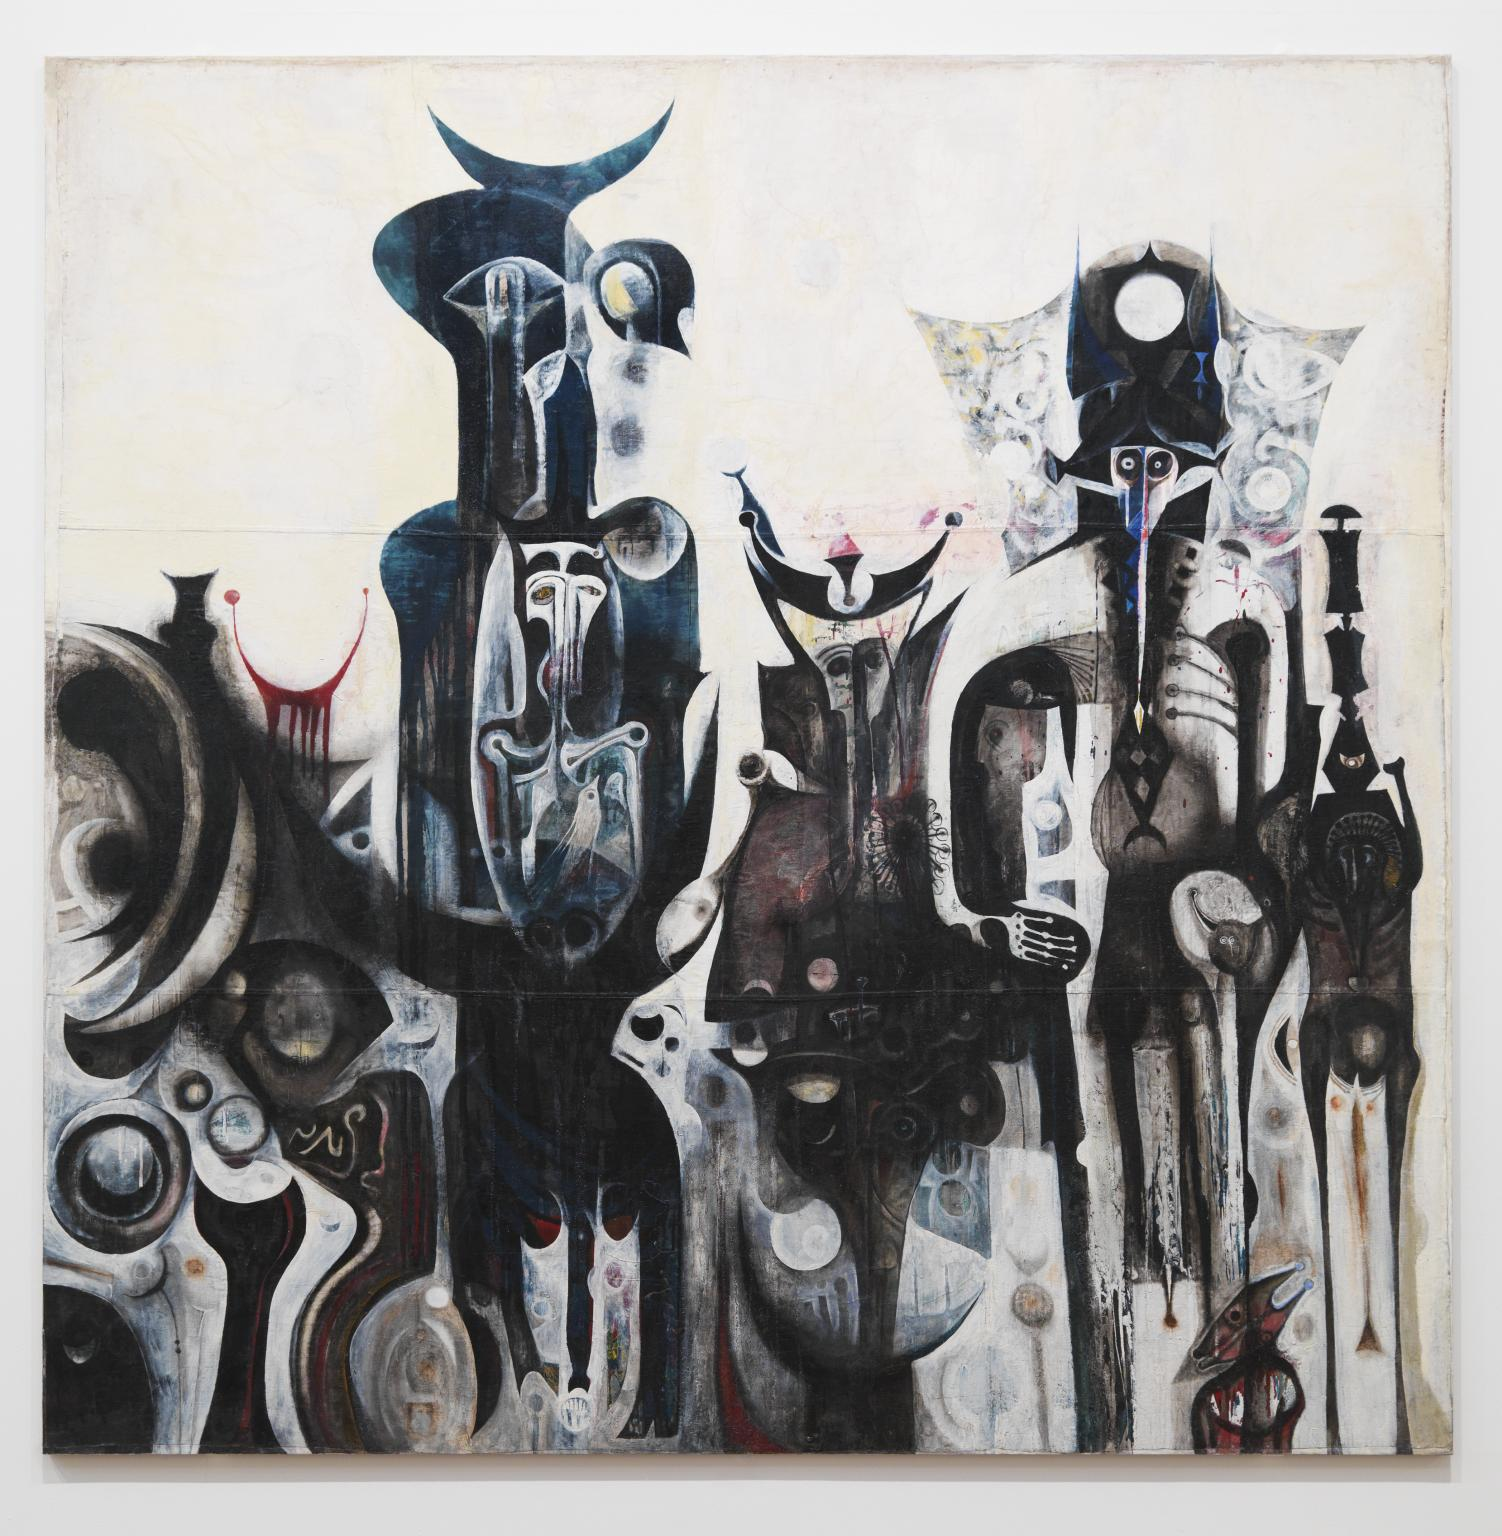 Reborn Sounds of Childhood Dreams I 1961-5 by Ibrahim El-Salahi born 1930